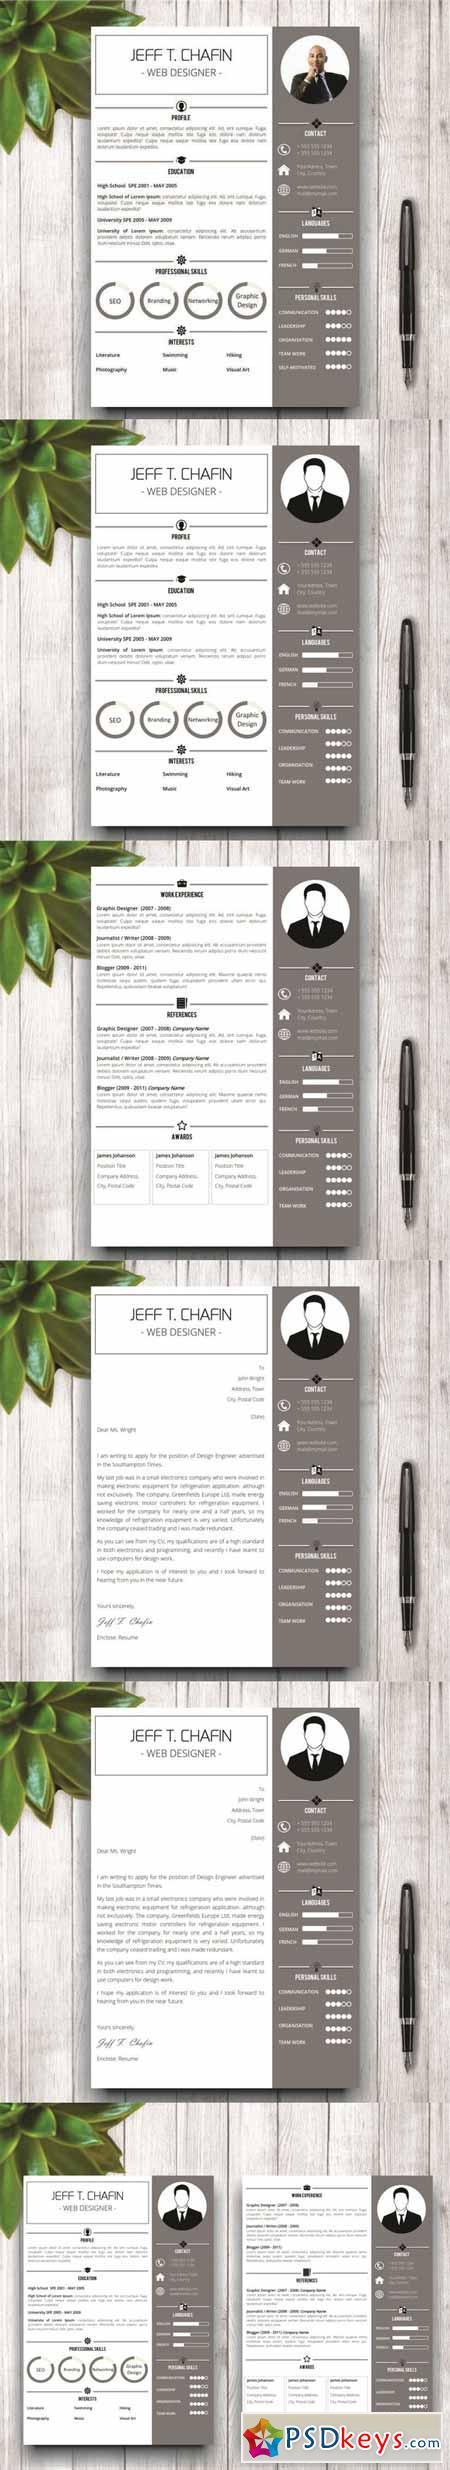 Simple Resume Template in MS Word 561406